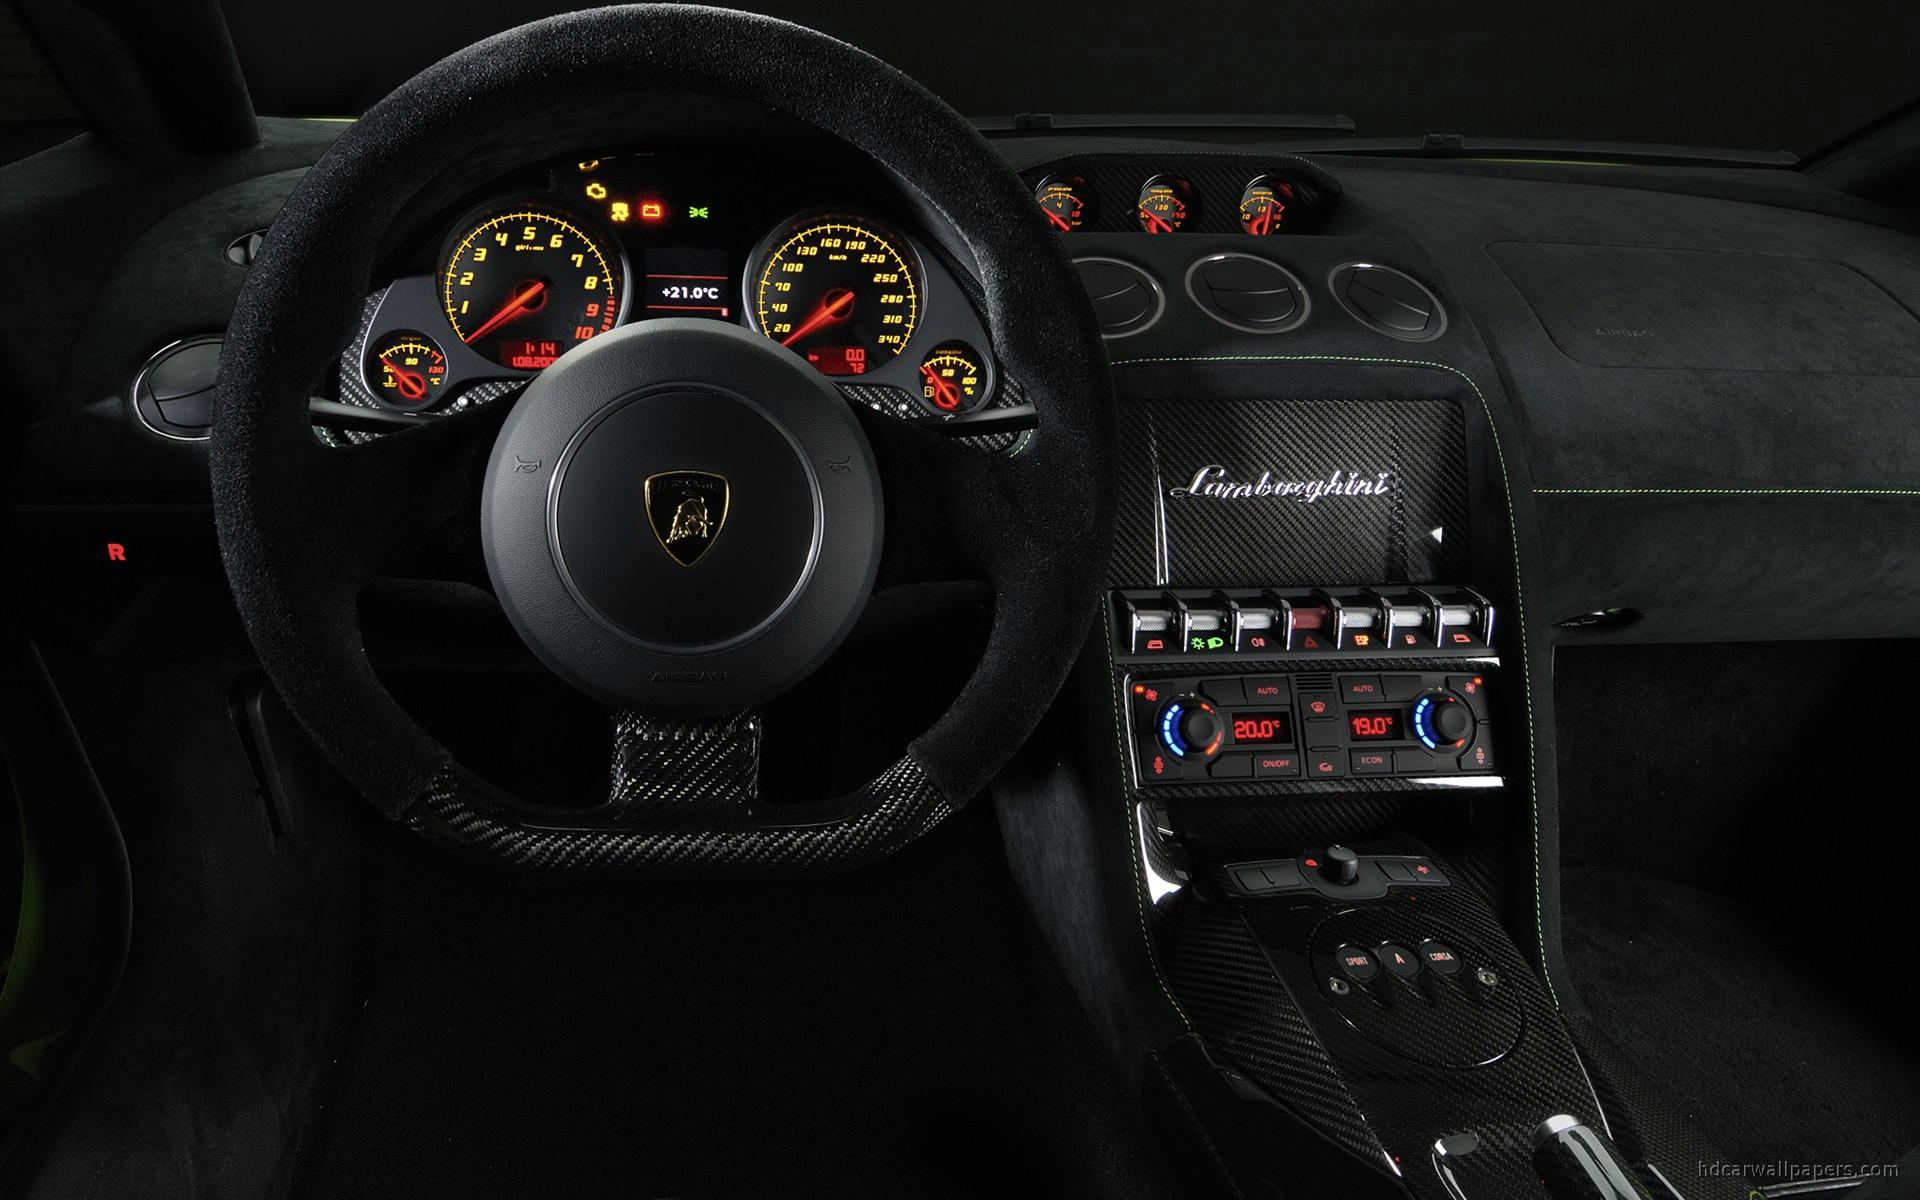 2011 Lamborghini Gallardo Lp 570 4 Superleggera Interior Wallpaper